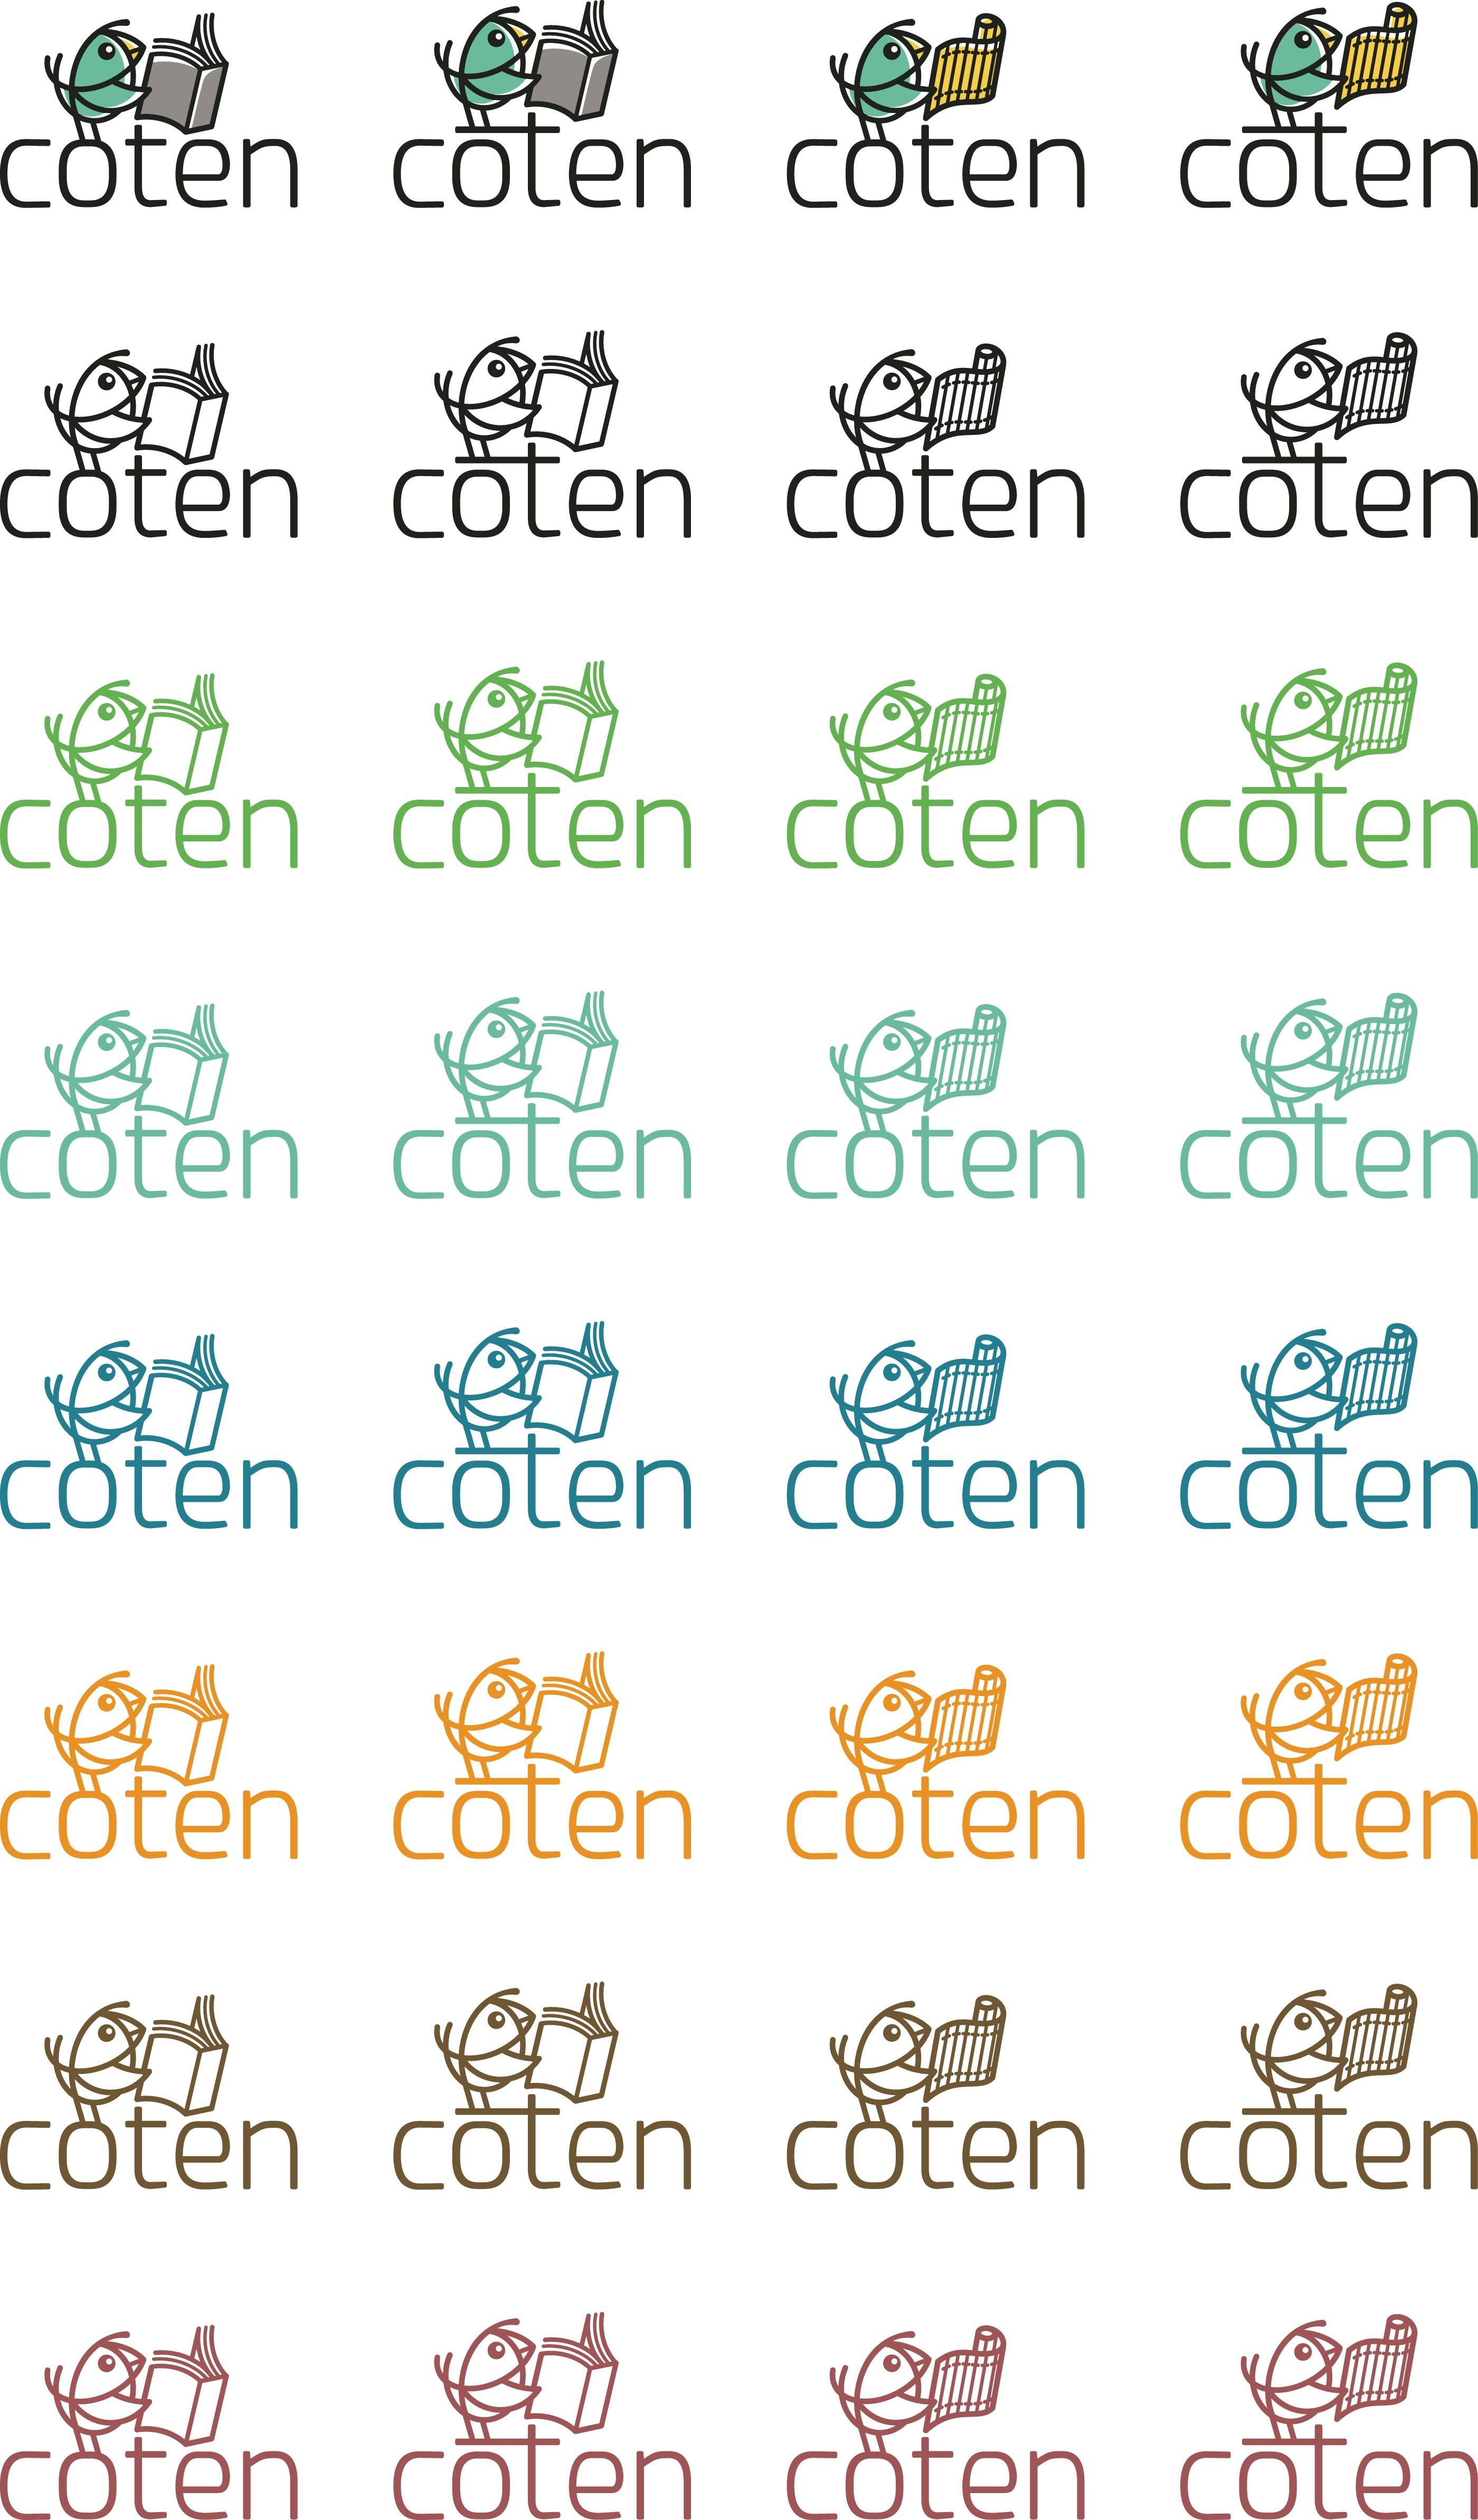 the company [coten][COTEN] logo with animal.